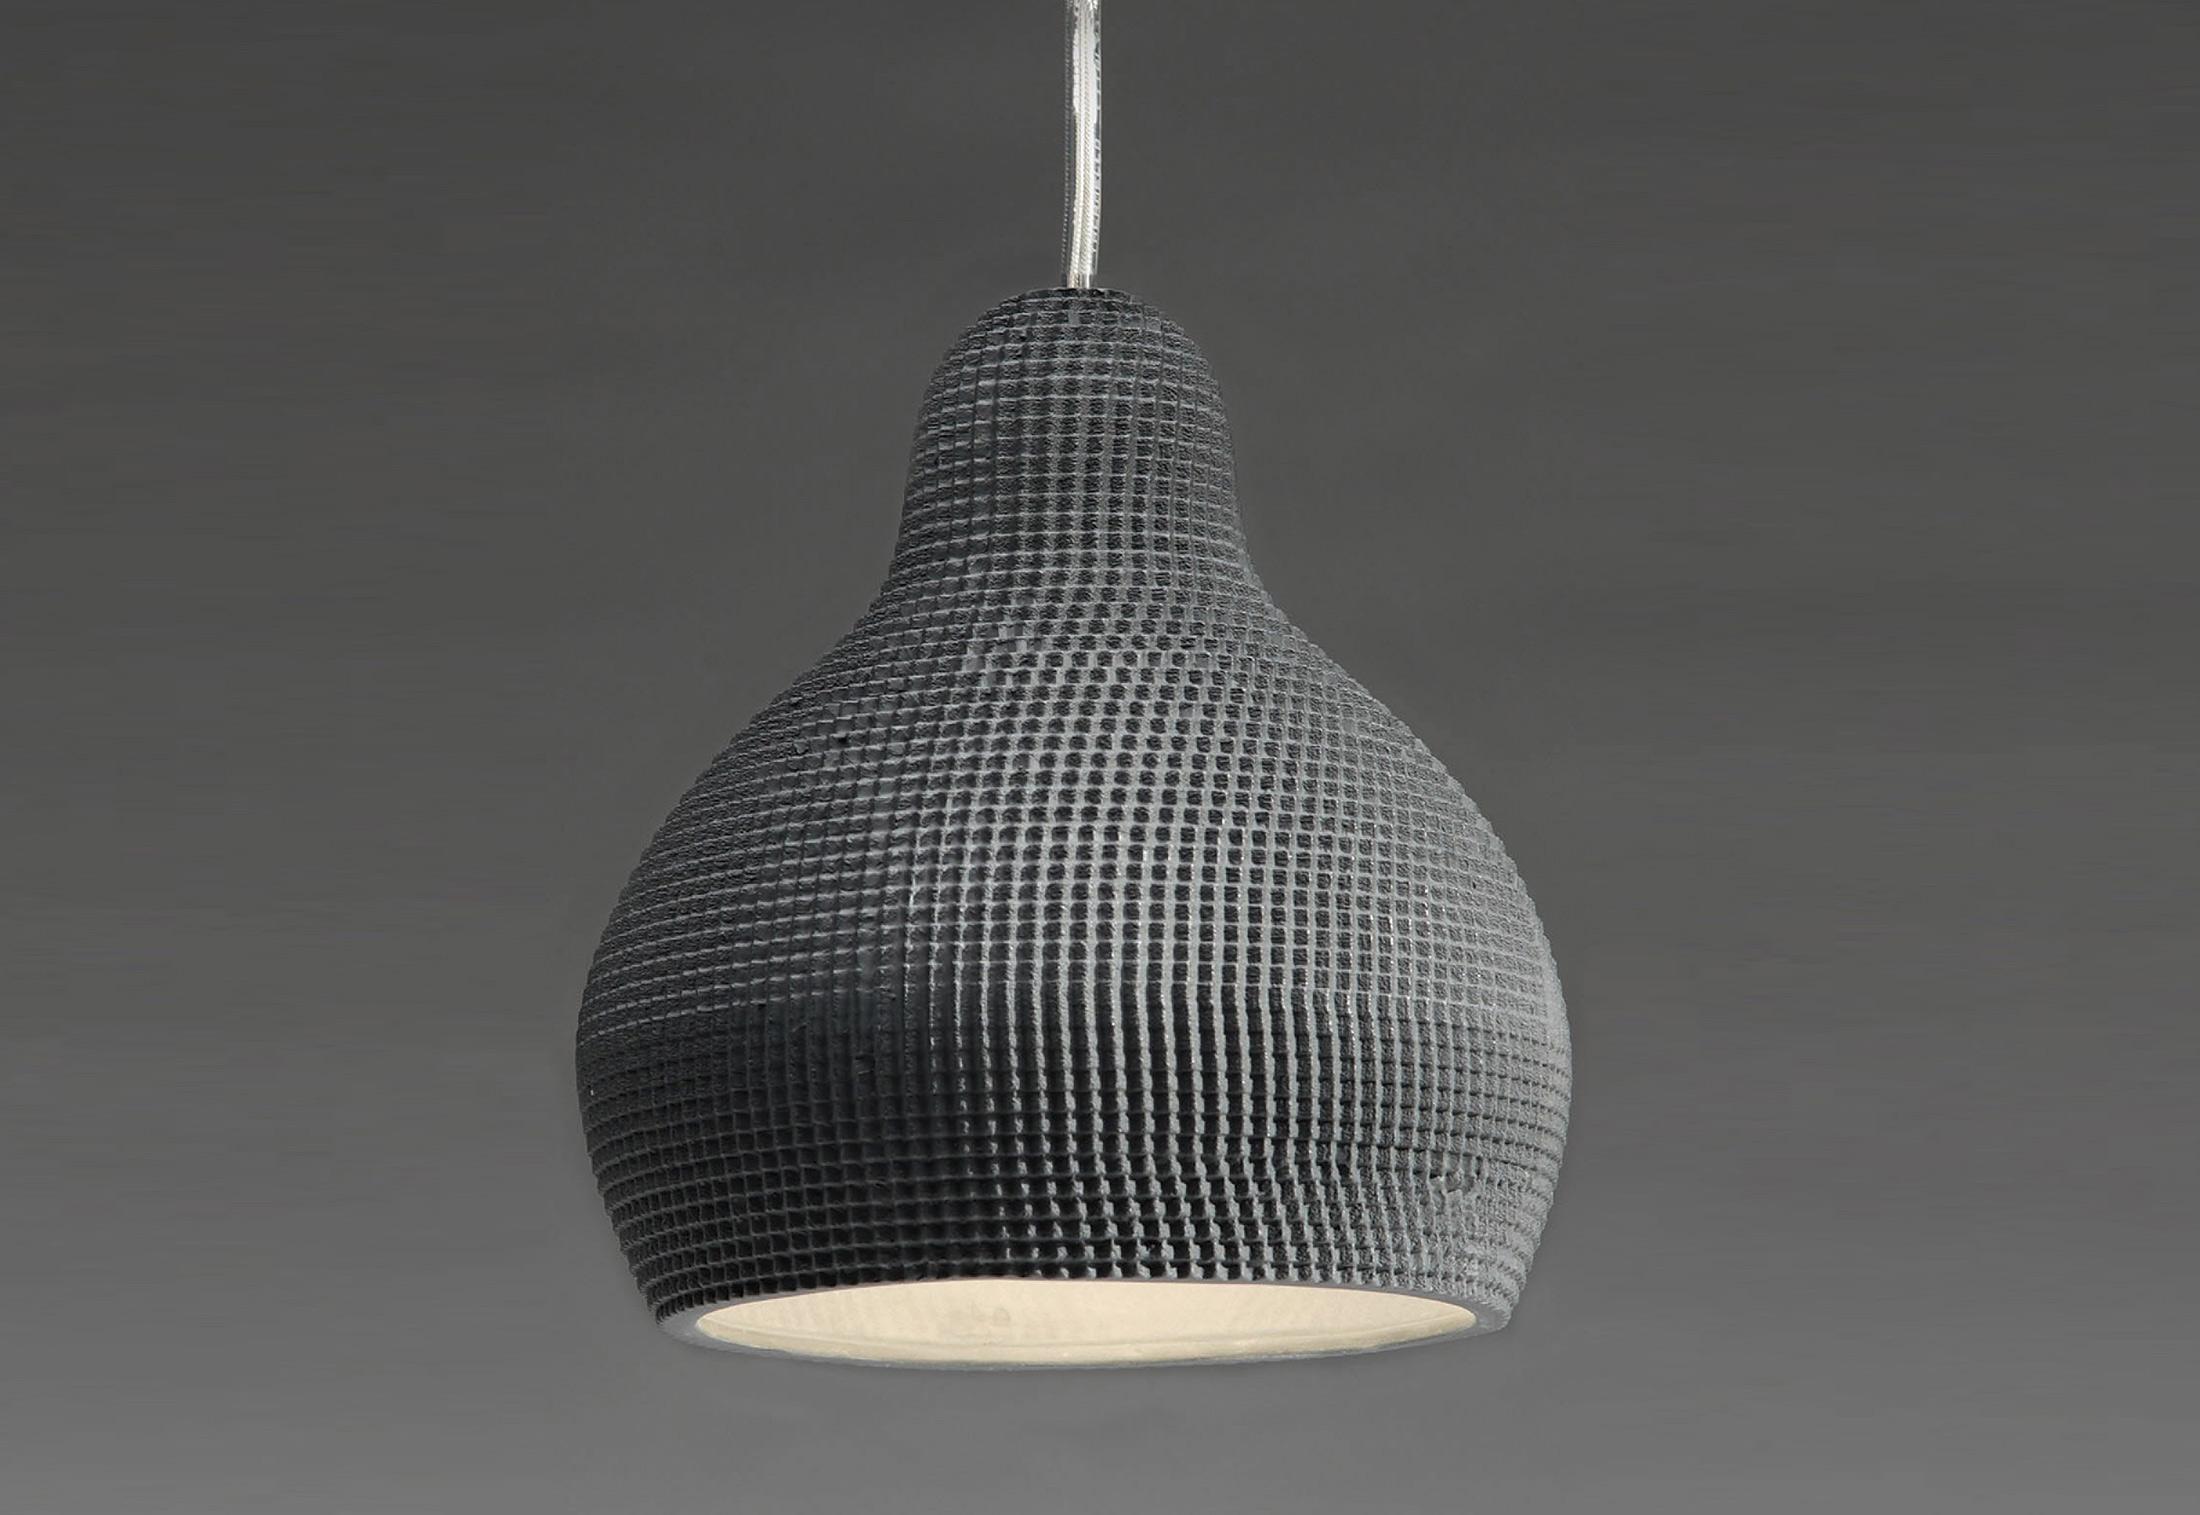 lampe-144dpi-1 Spannende Lampen Frankfurt Am Main Dekorationen